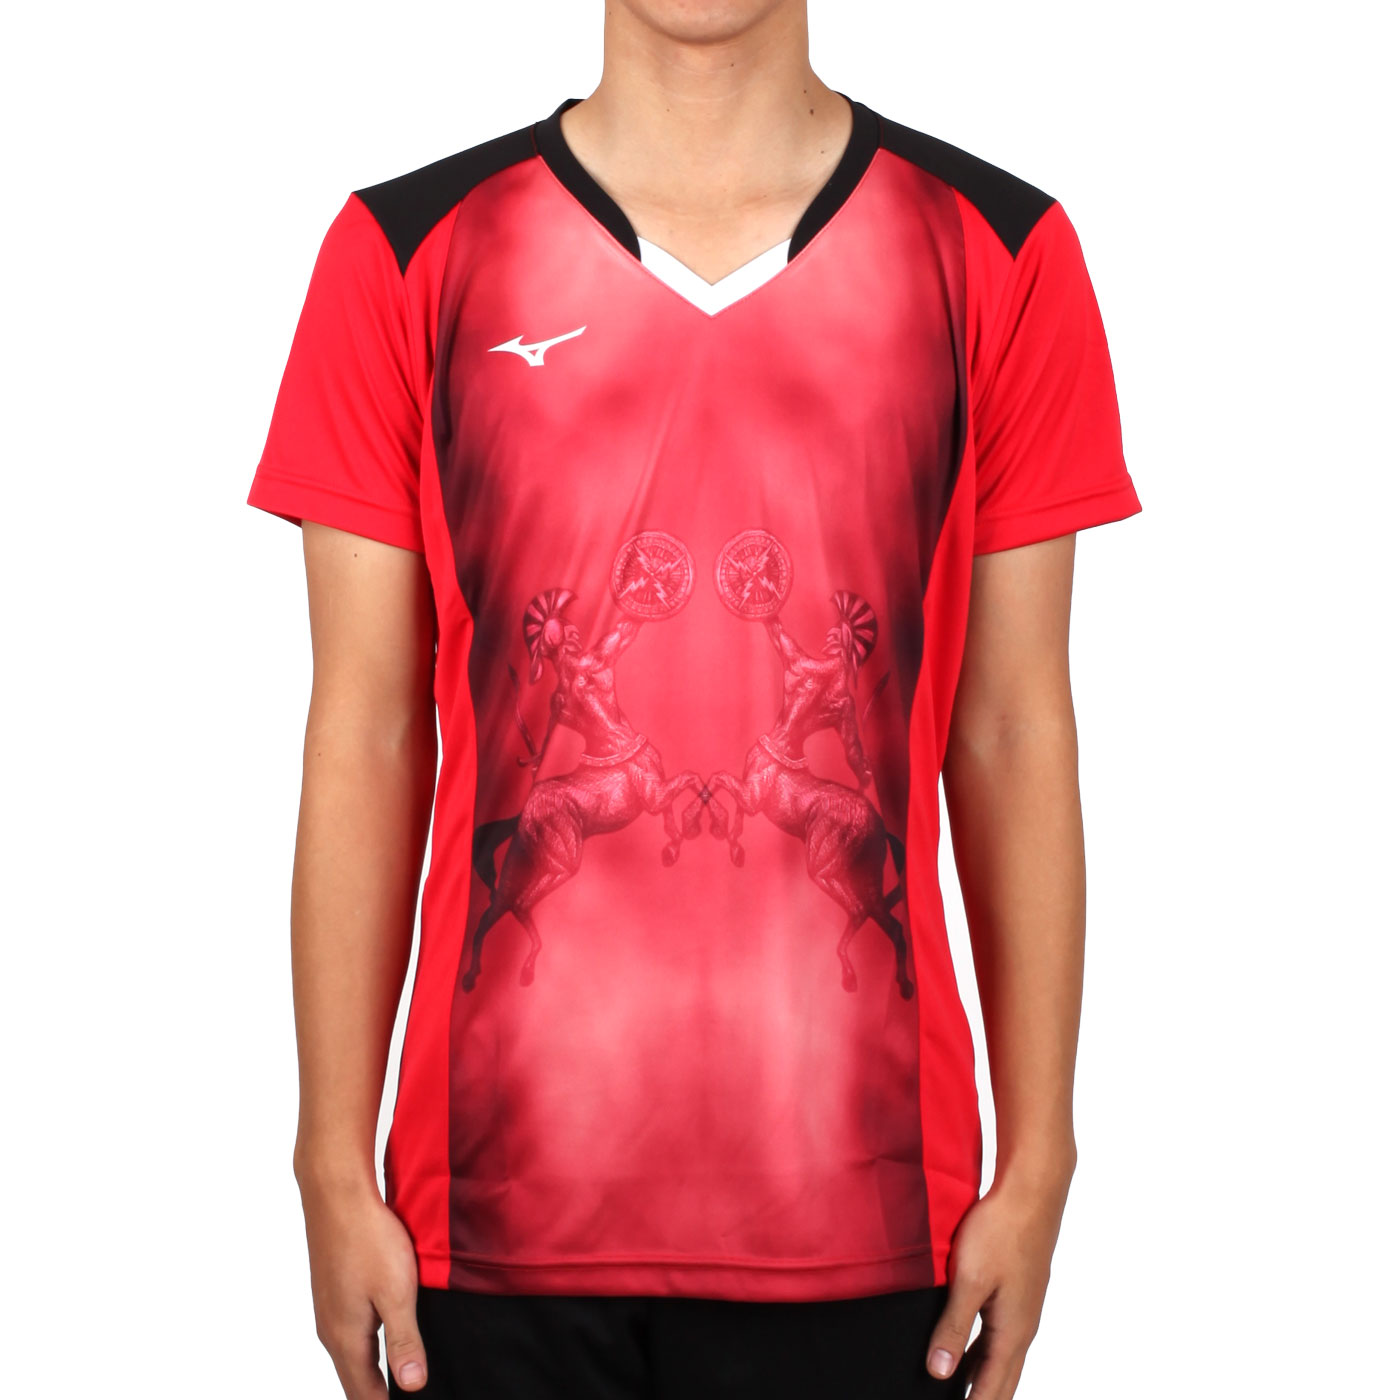 MIZUNO 男排球短袖上衣(2017企業排球聯賽) V2TA7A3081D - 紅黑